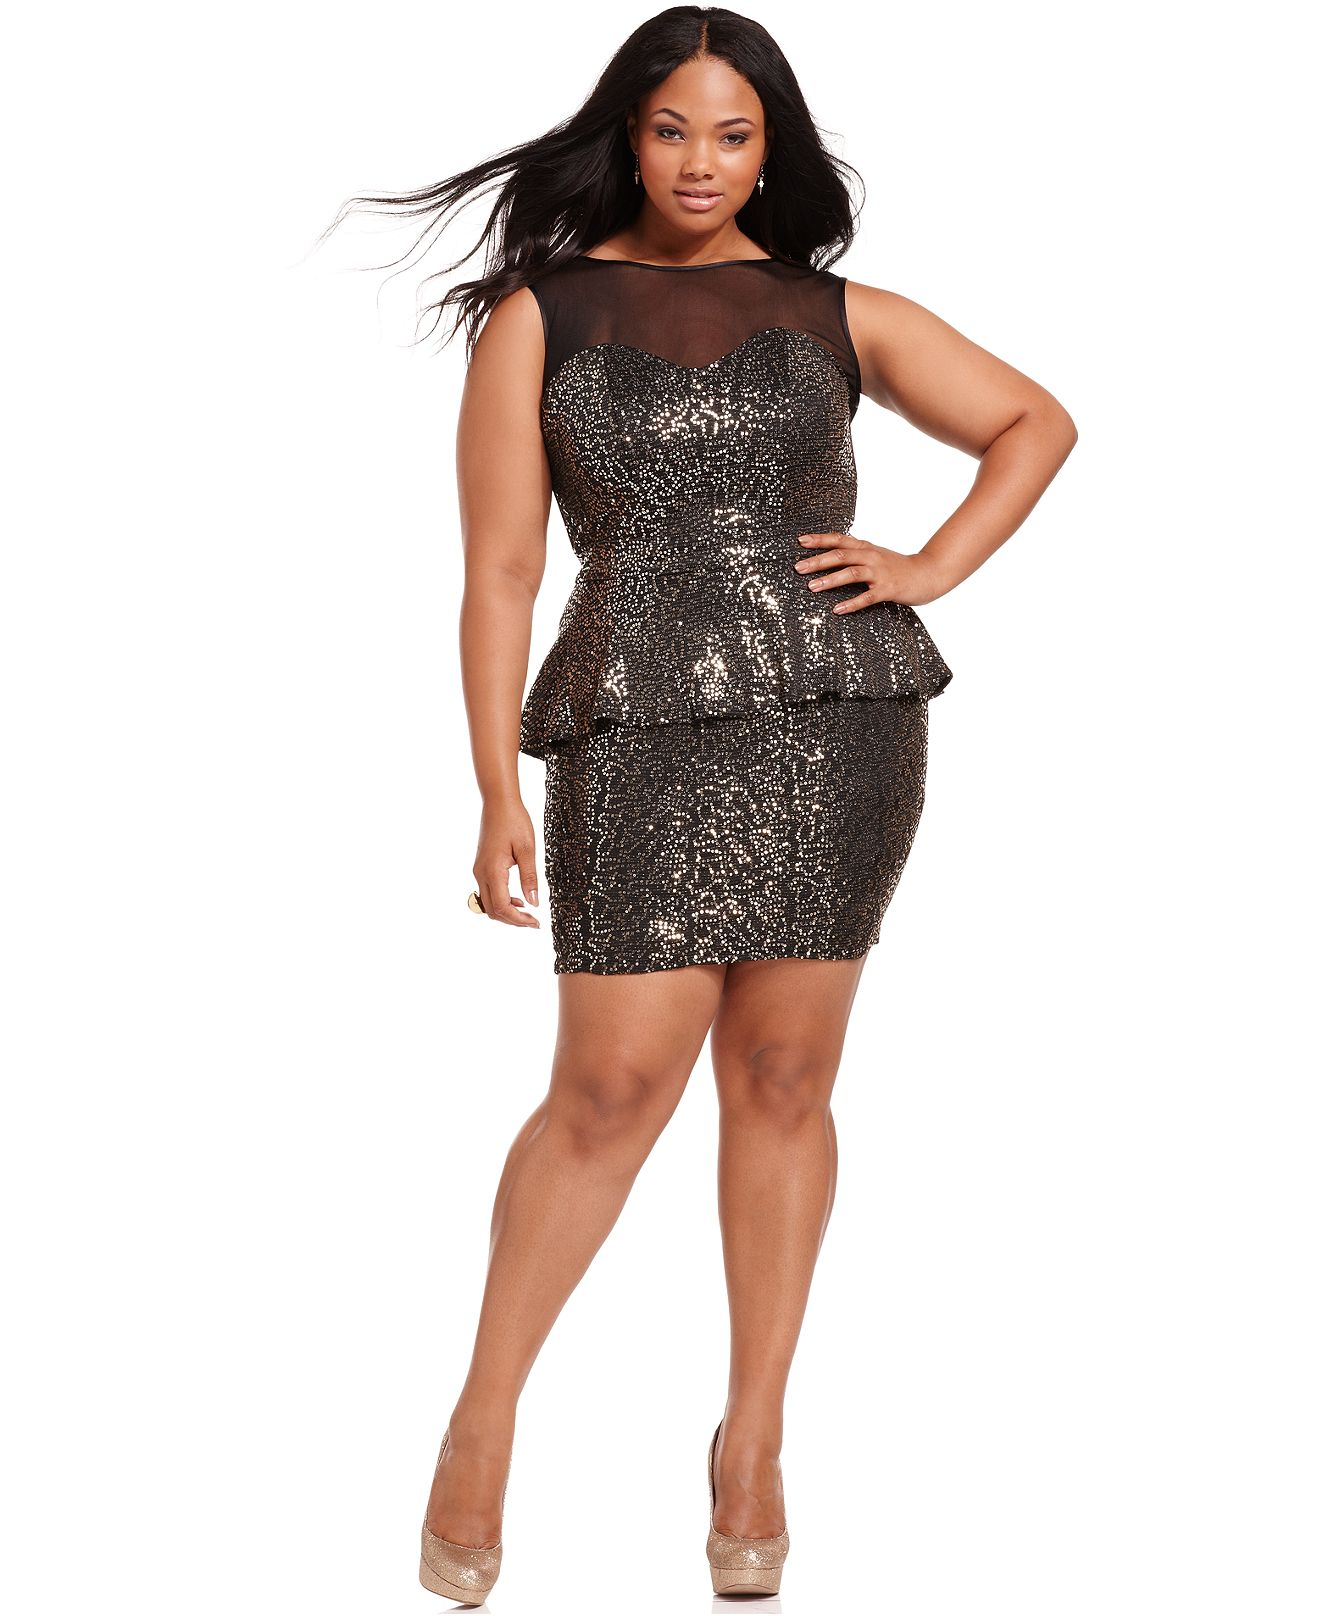 Black/Gold, Baby Phat Plus Size Dress, Sleeveless Sequin ...